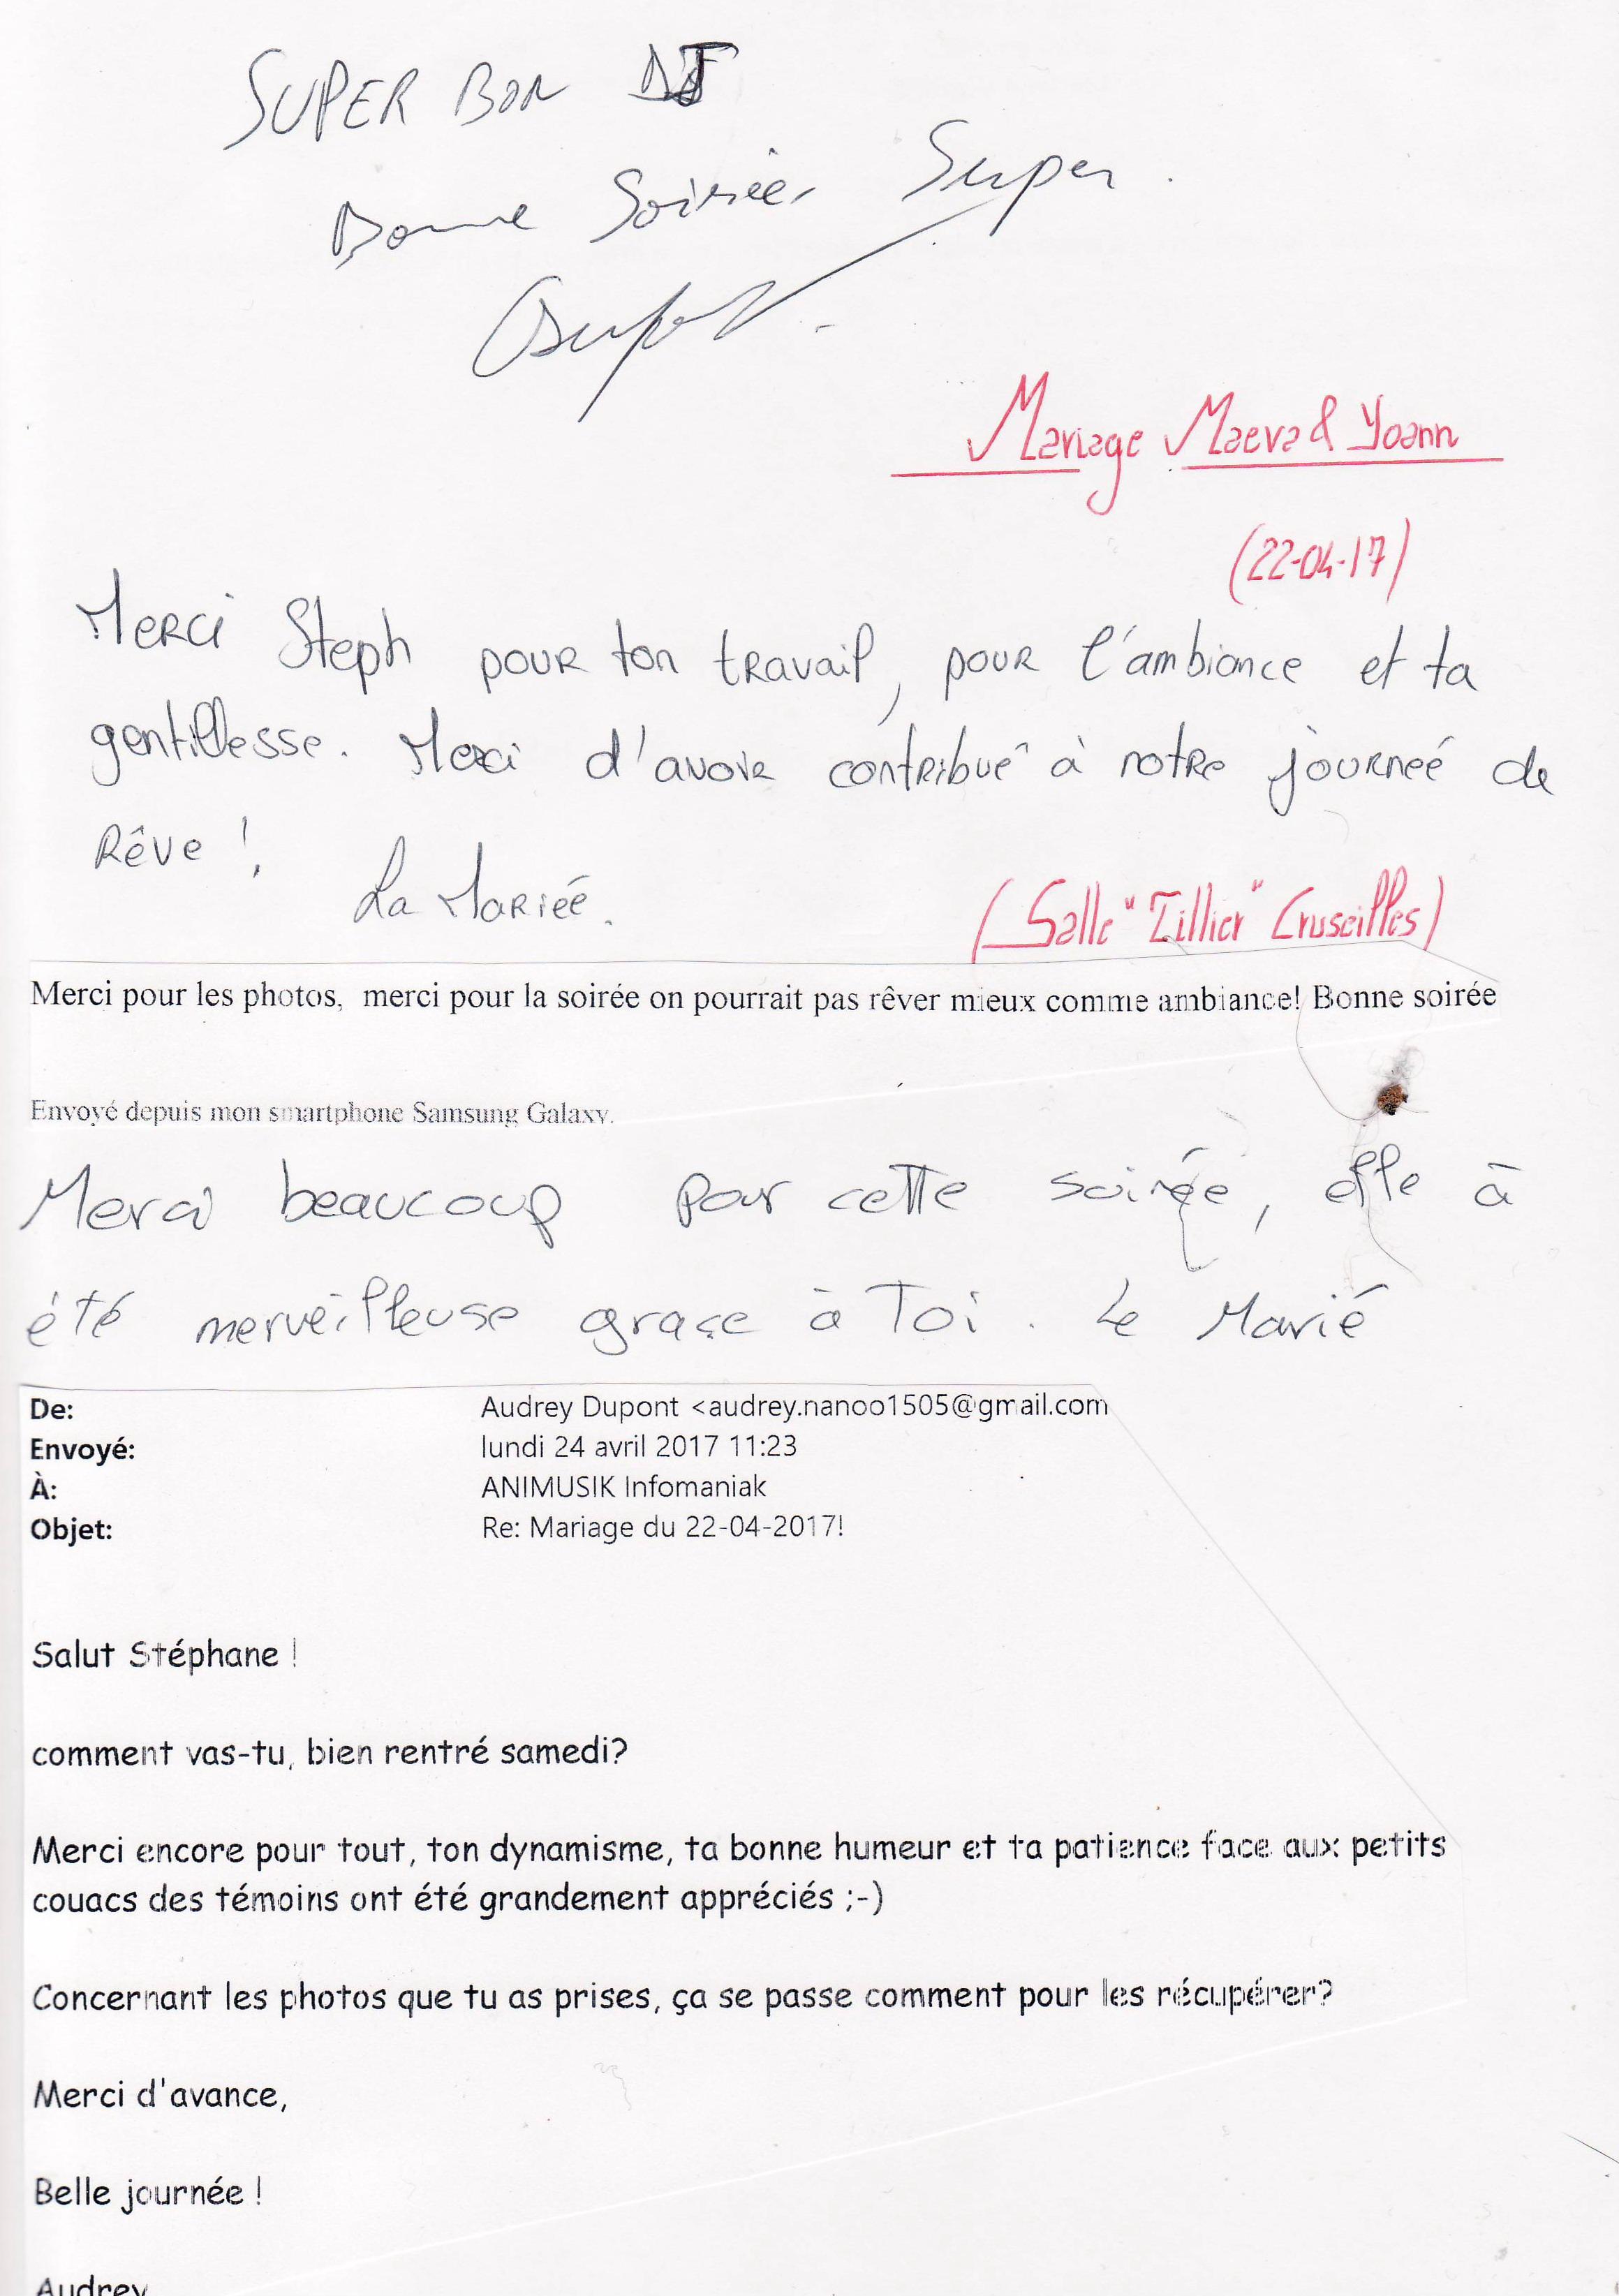 Mariage DUPONT Yoann & CHASSOT Maeva (Salle TILLIER Cruseilles) (22-04-2.._